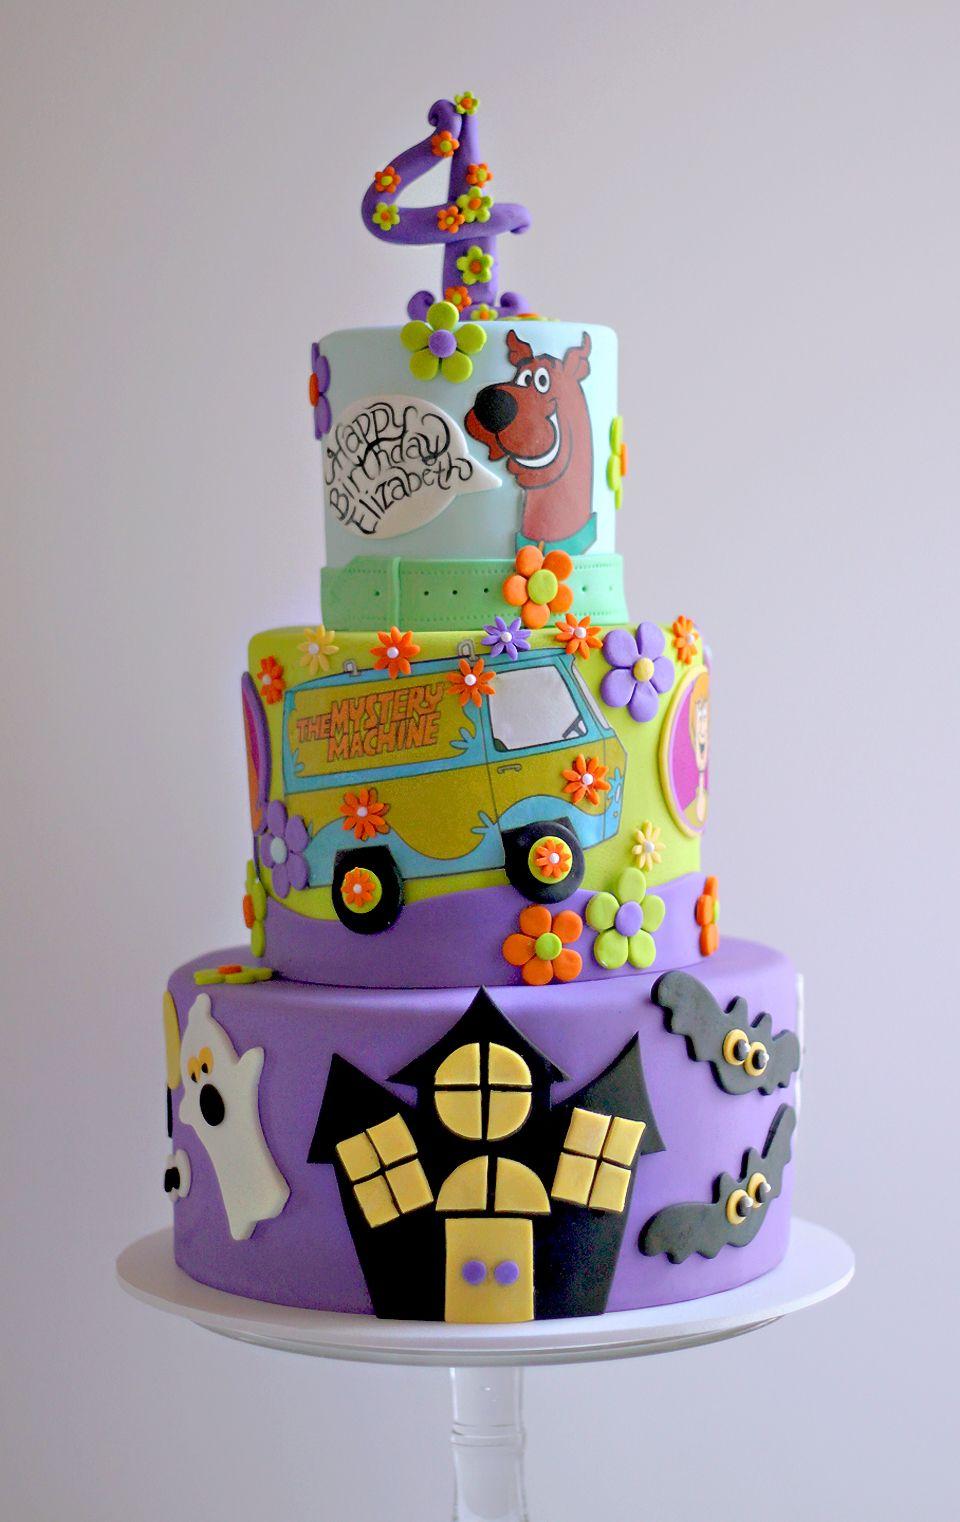 Tremendous Elizabeths Scooby Birthday Cake With Images Scooby Doo Funny Birthday Cards Online Elaedamsfinfo